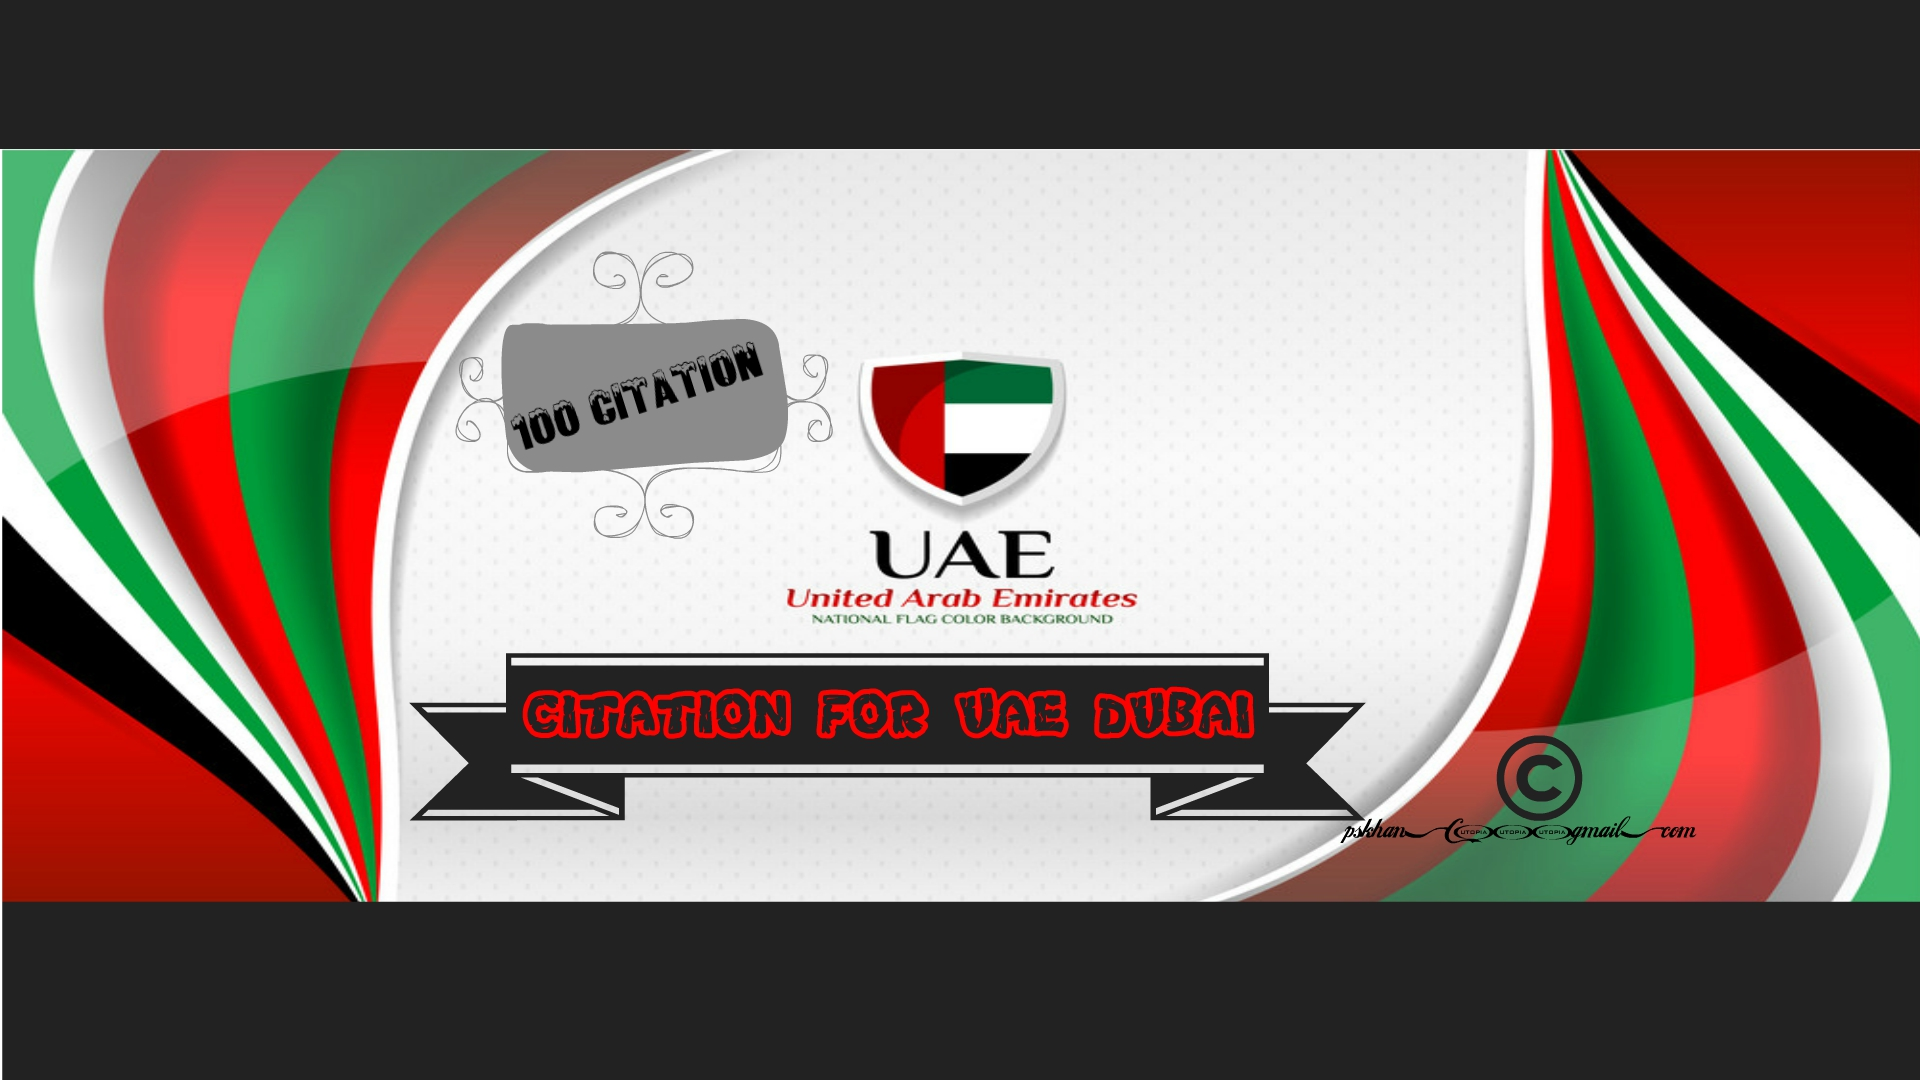 100 local SEO citation for UAE Dubai